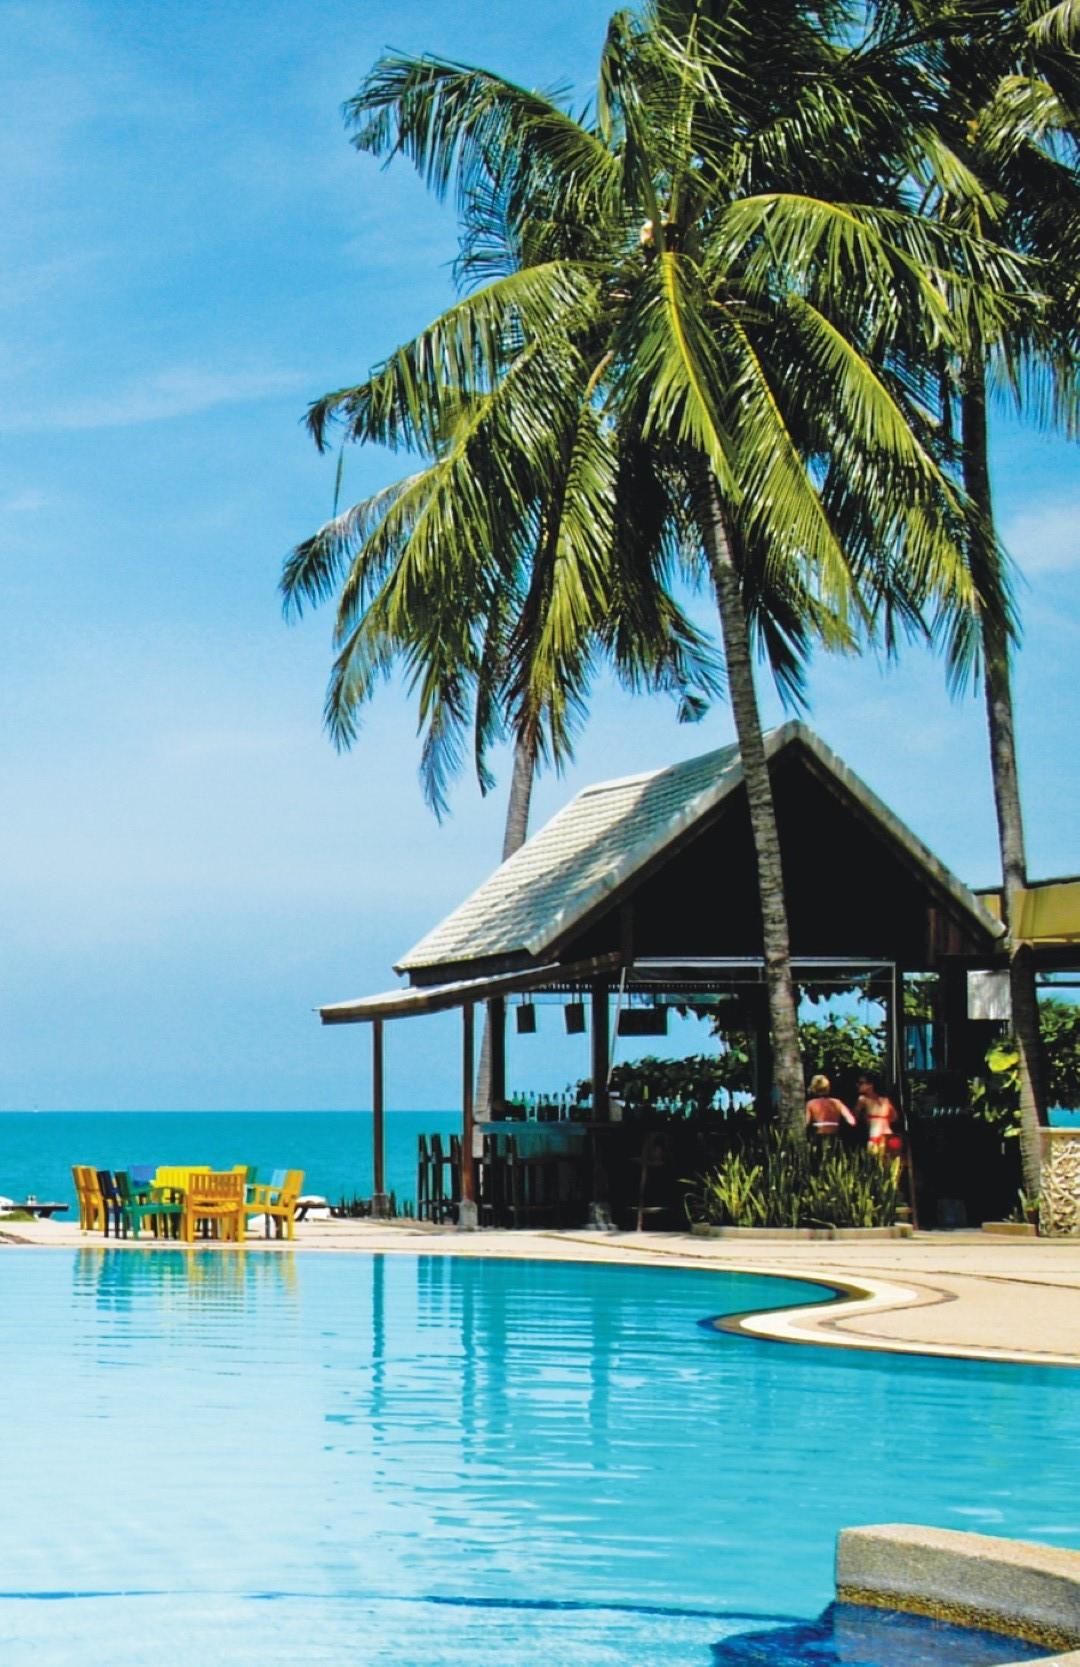 Peace Resort休闲度假氛围(一)